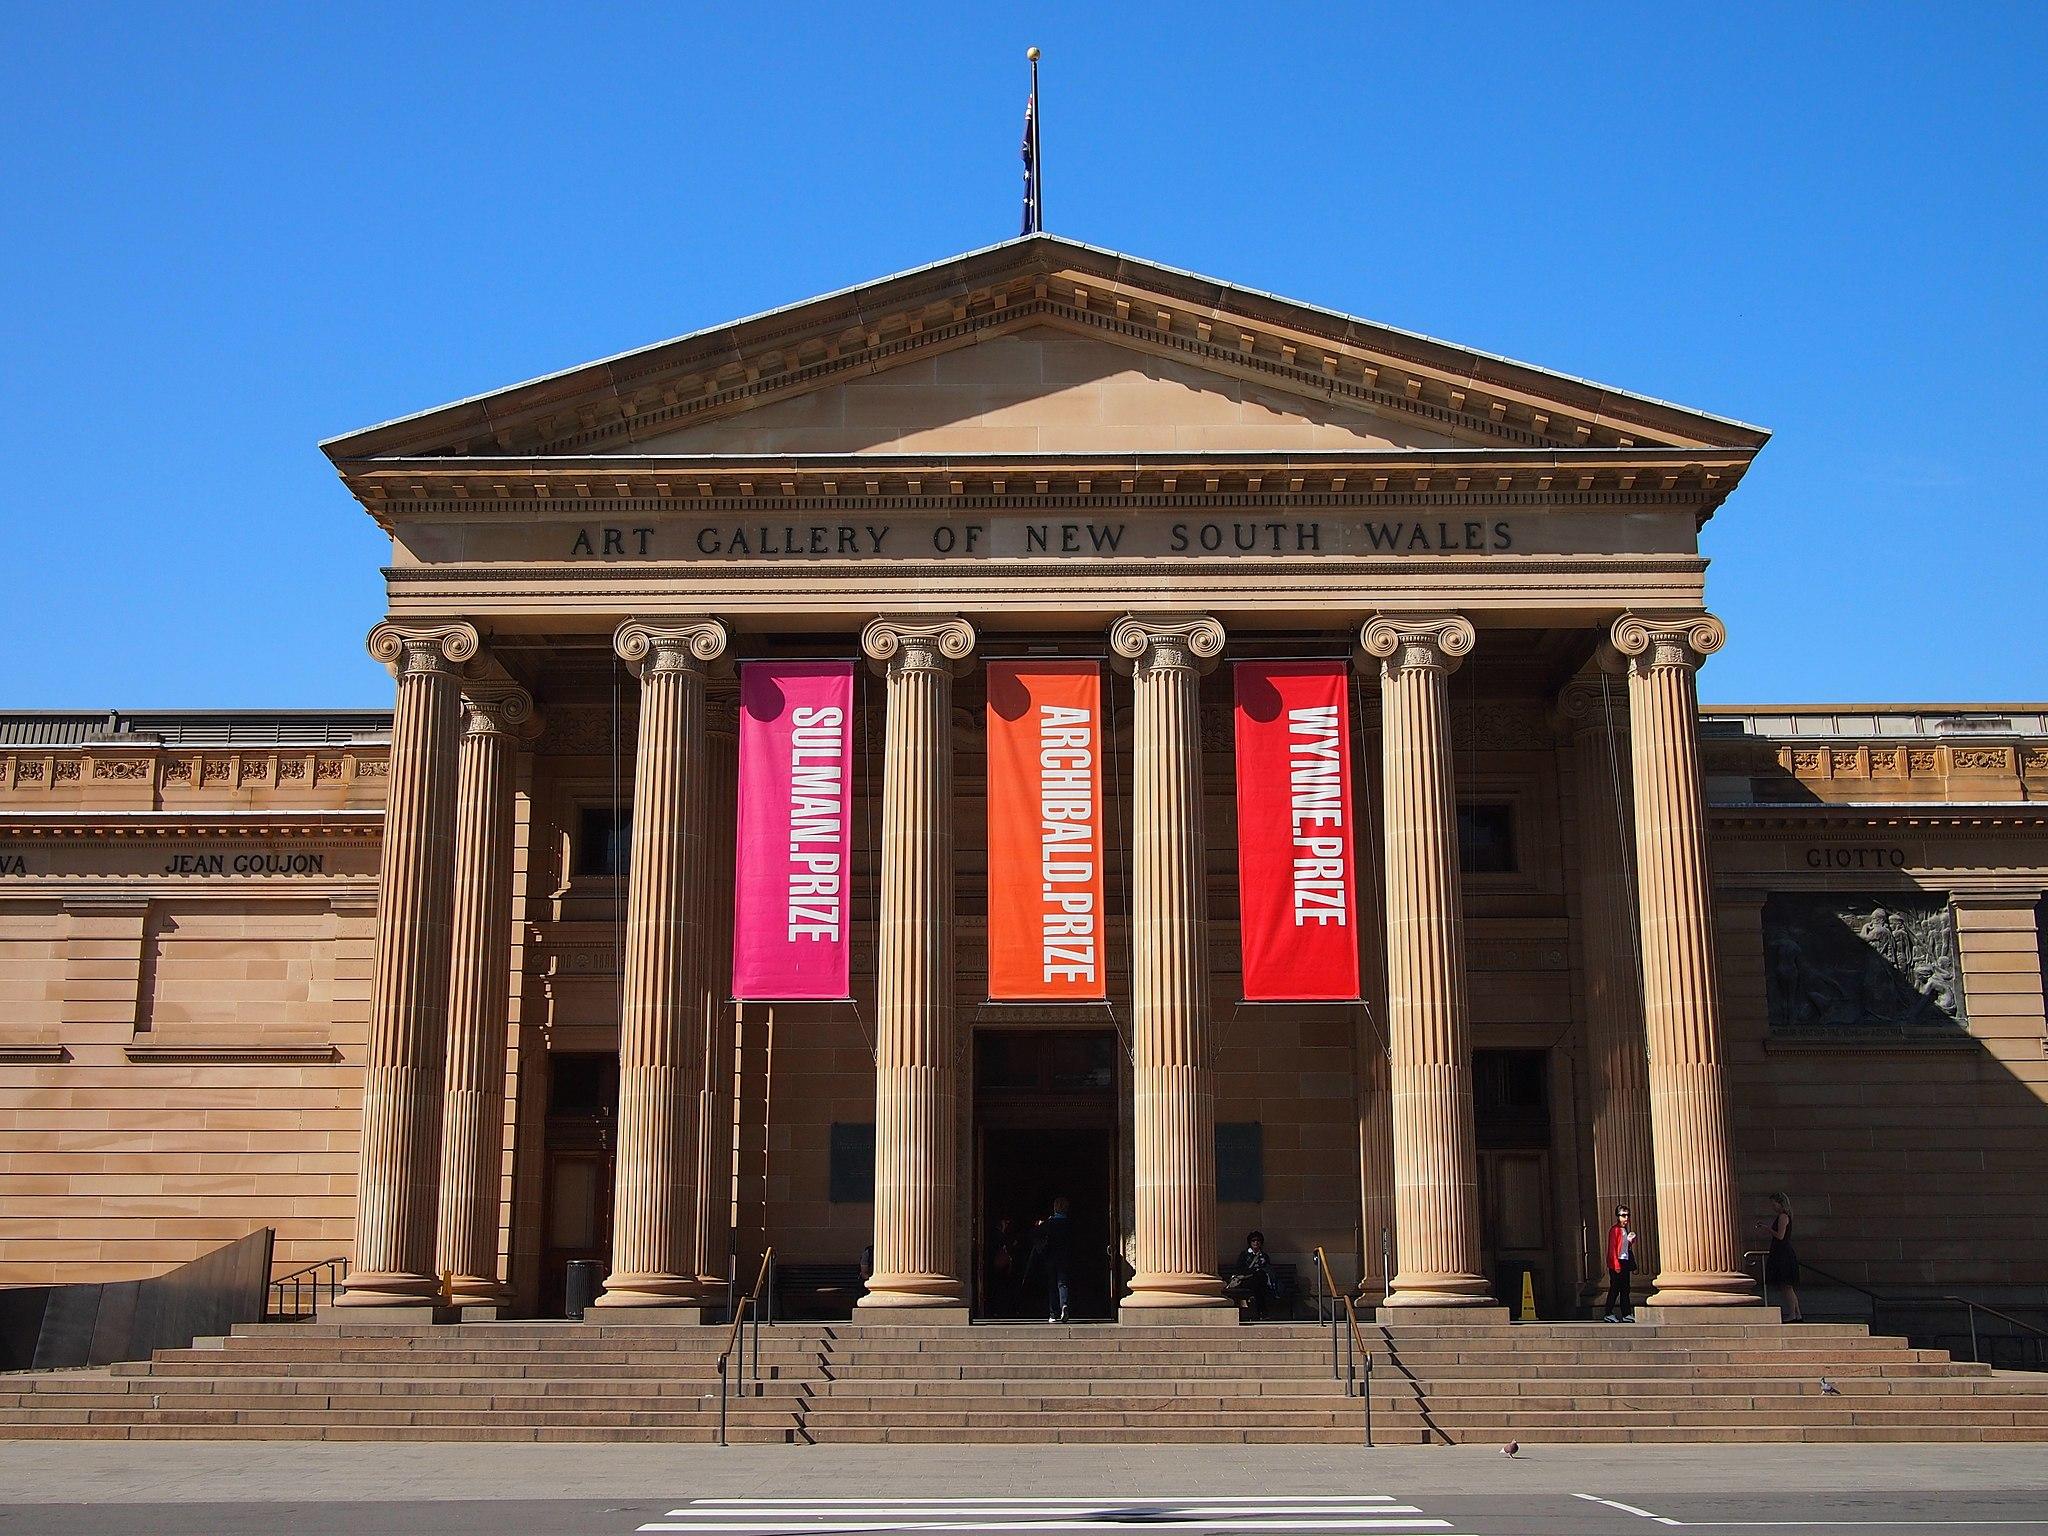 Art Gallery of NSW by Nick-D .  CC BY-SA 3.0  via Wikimedia